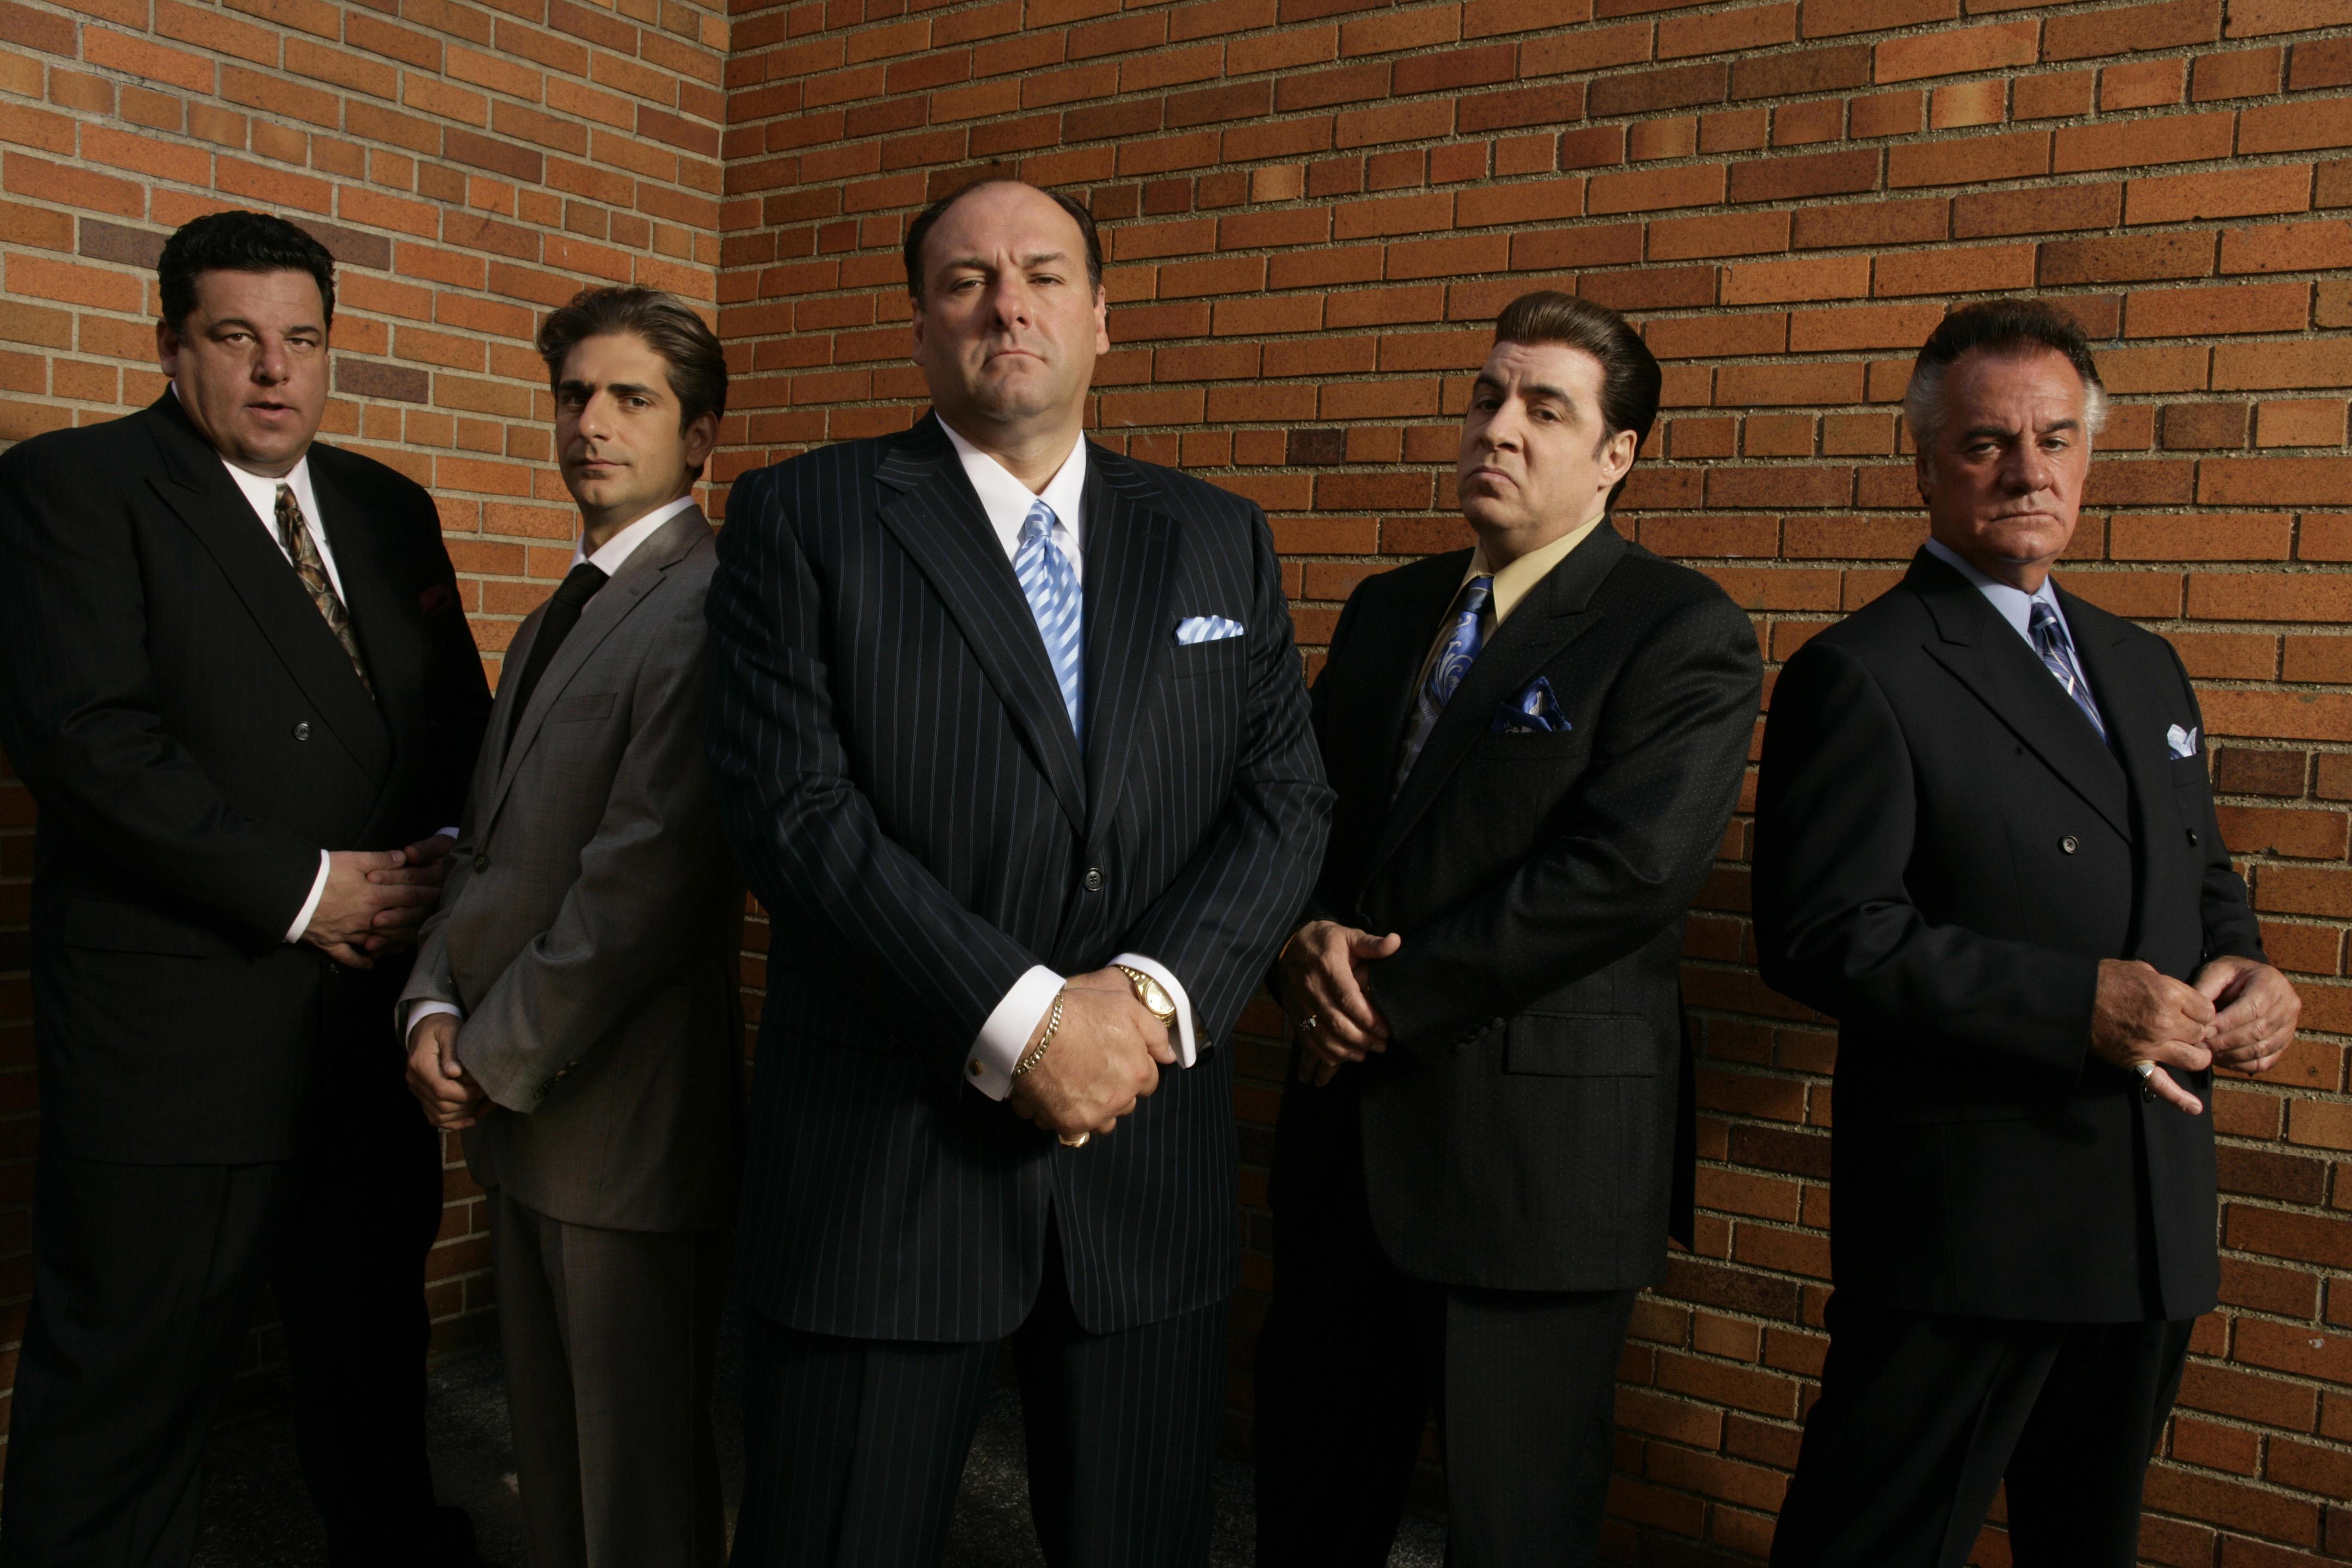 Serie Sopranos